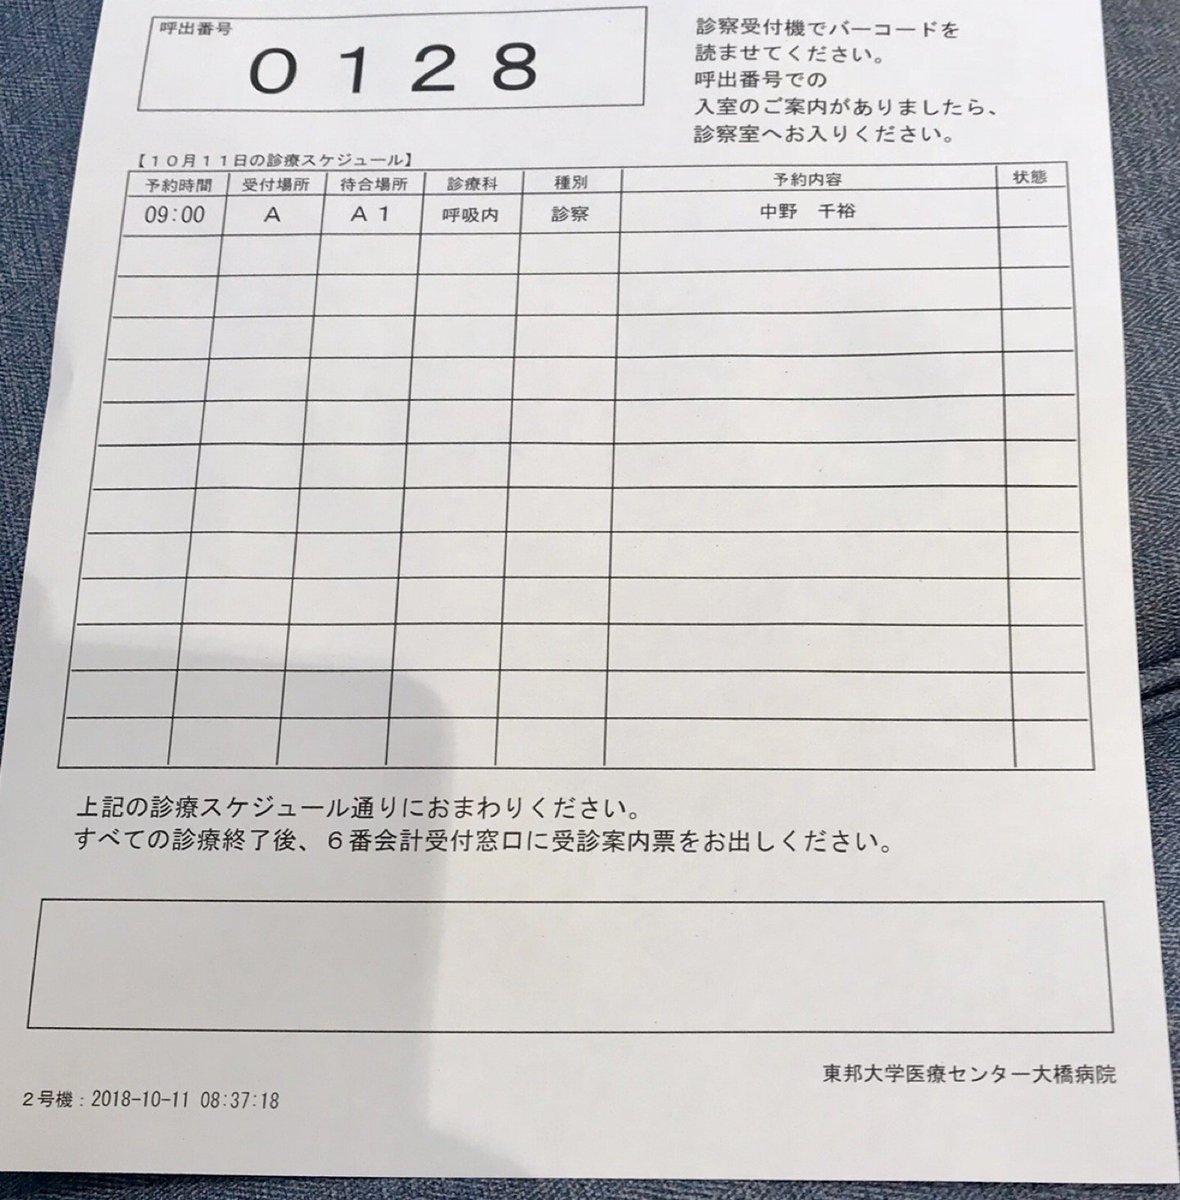 test ツイッターメディア - I'm at 東邦大学医療センター大橋病院 in 目黒区, 東京都 w/ @ichigojuice42 https://t.co/C0duqayekw https://t.co/FHh2bVoWEr